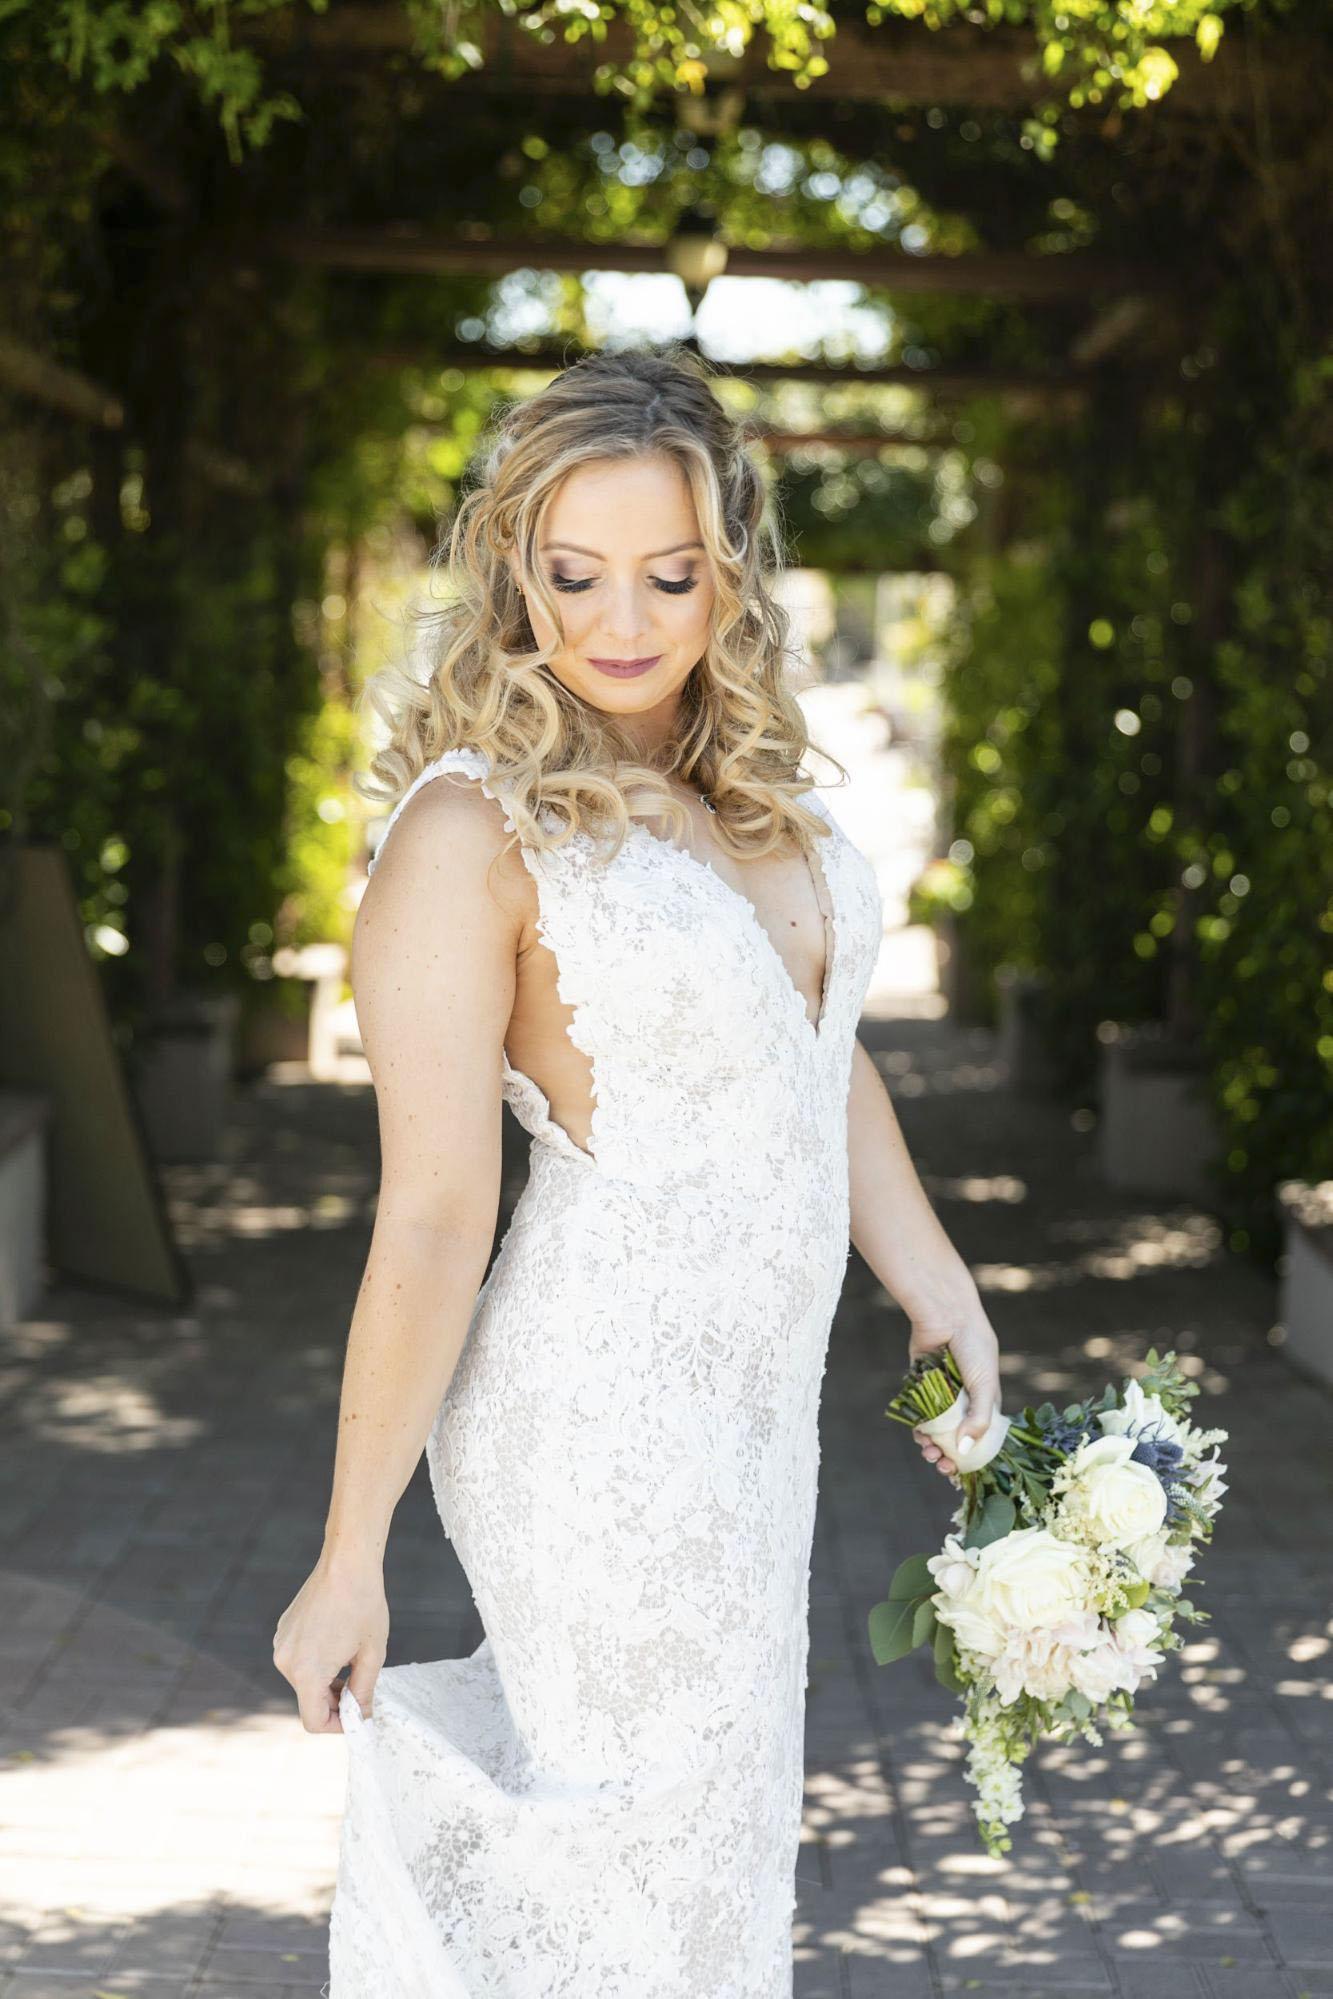 Domenica Beauty _ Hair and Makeup Artist _Blog _ Temecula, CA Wedding_ 03.JPG